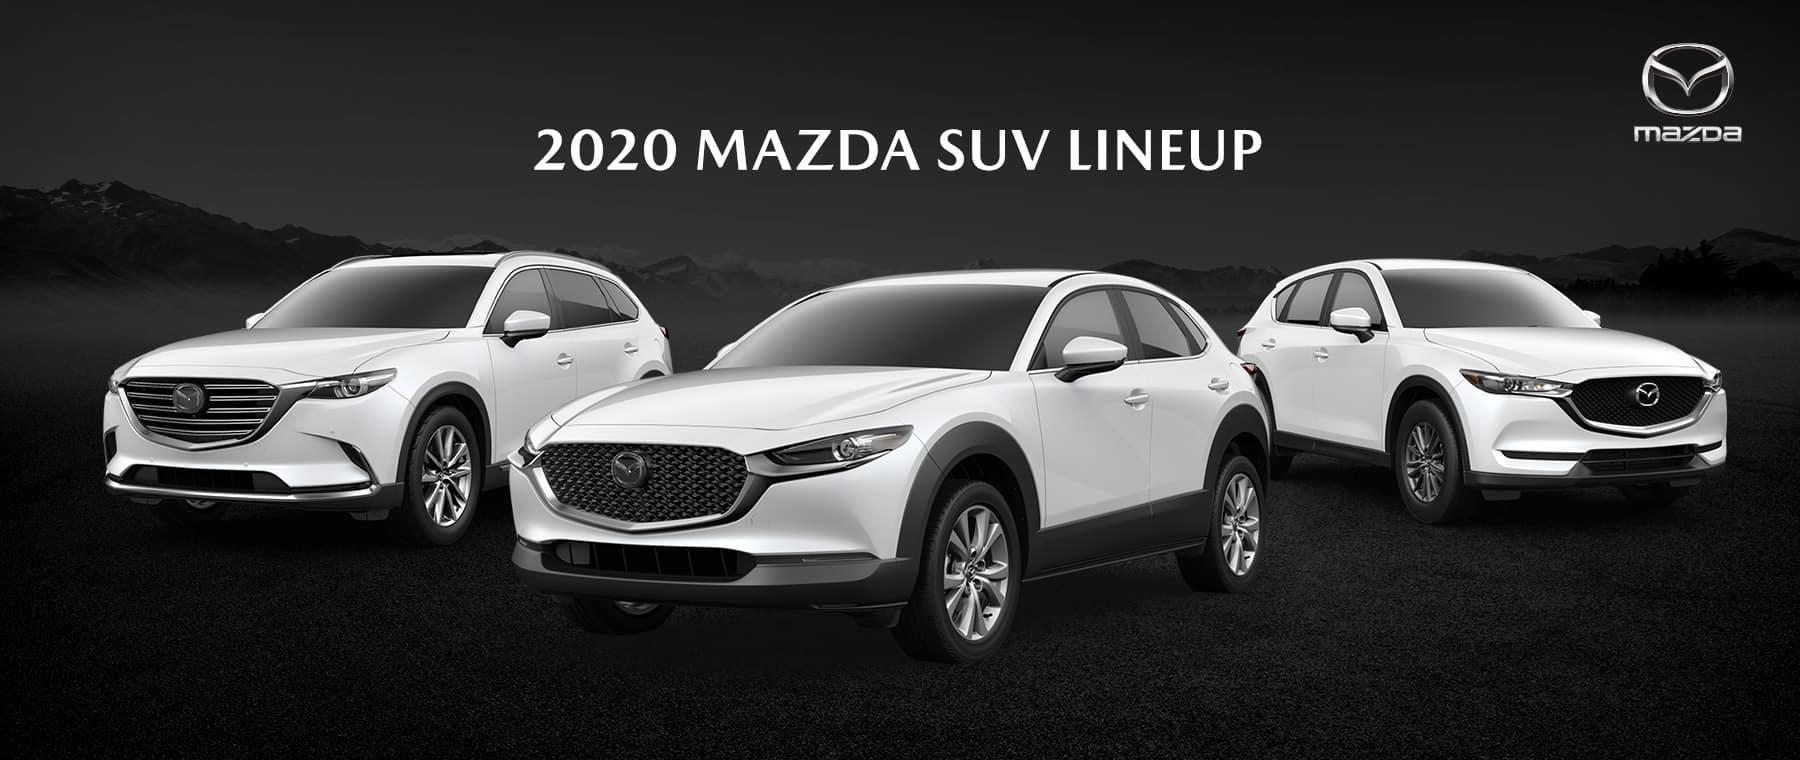 2020 Mazda SUV Lineup - Bert Ogden Mission Mazda - Mission, TX